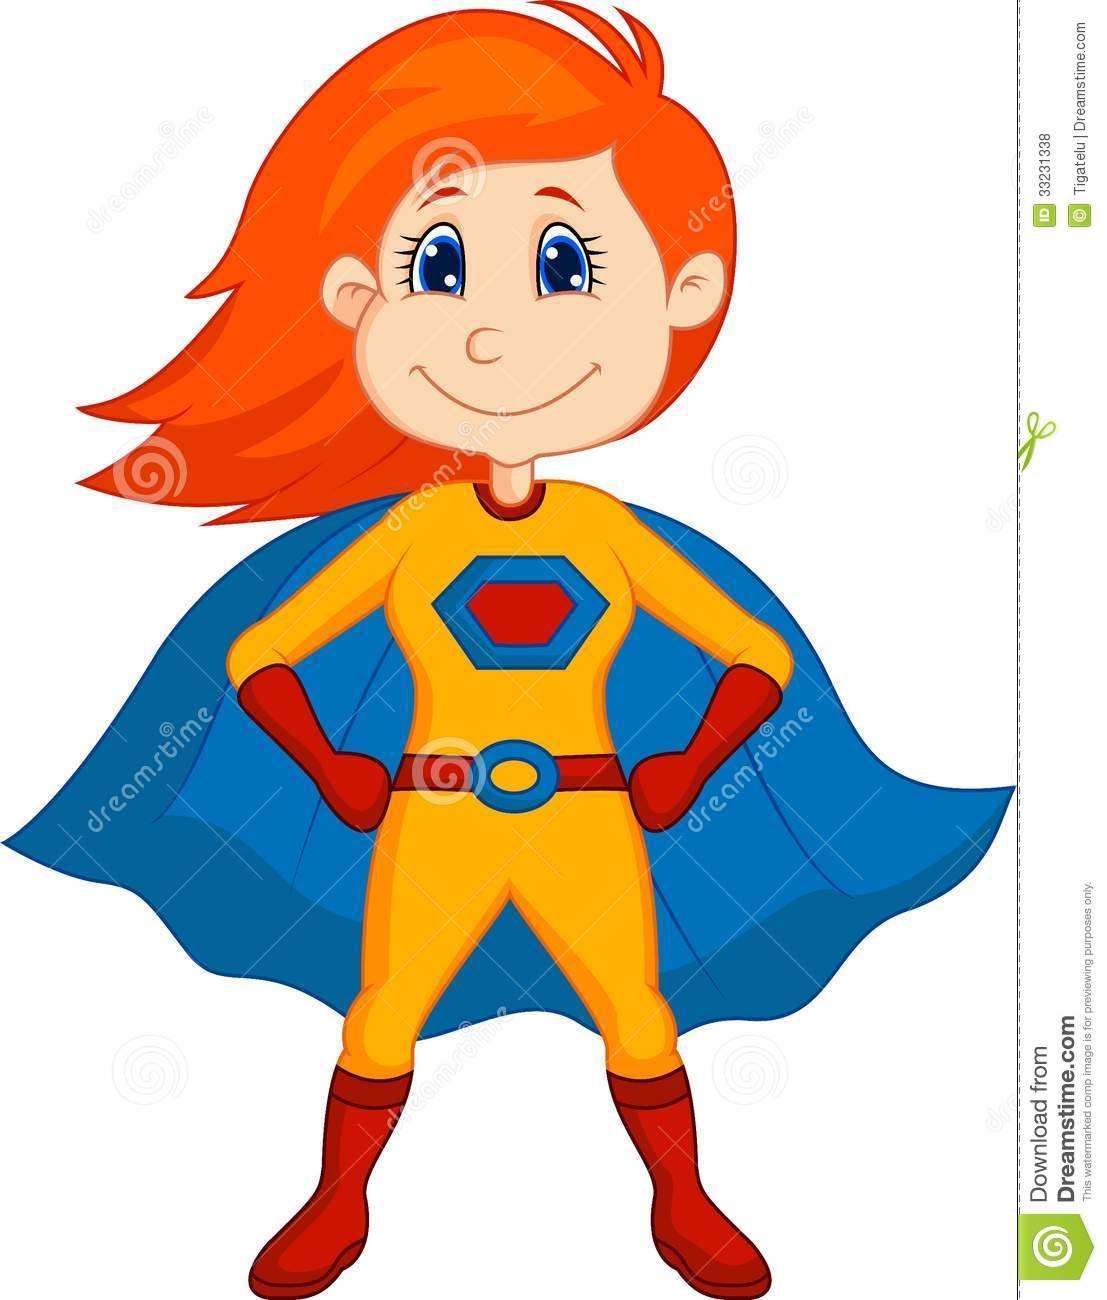 Soul Eater Kid Death Drawing Superhero Kids Superhero Clipart Superhero Cartoon